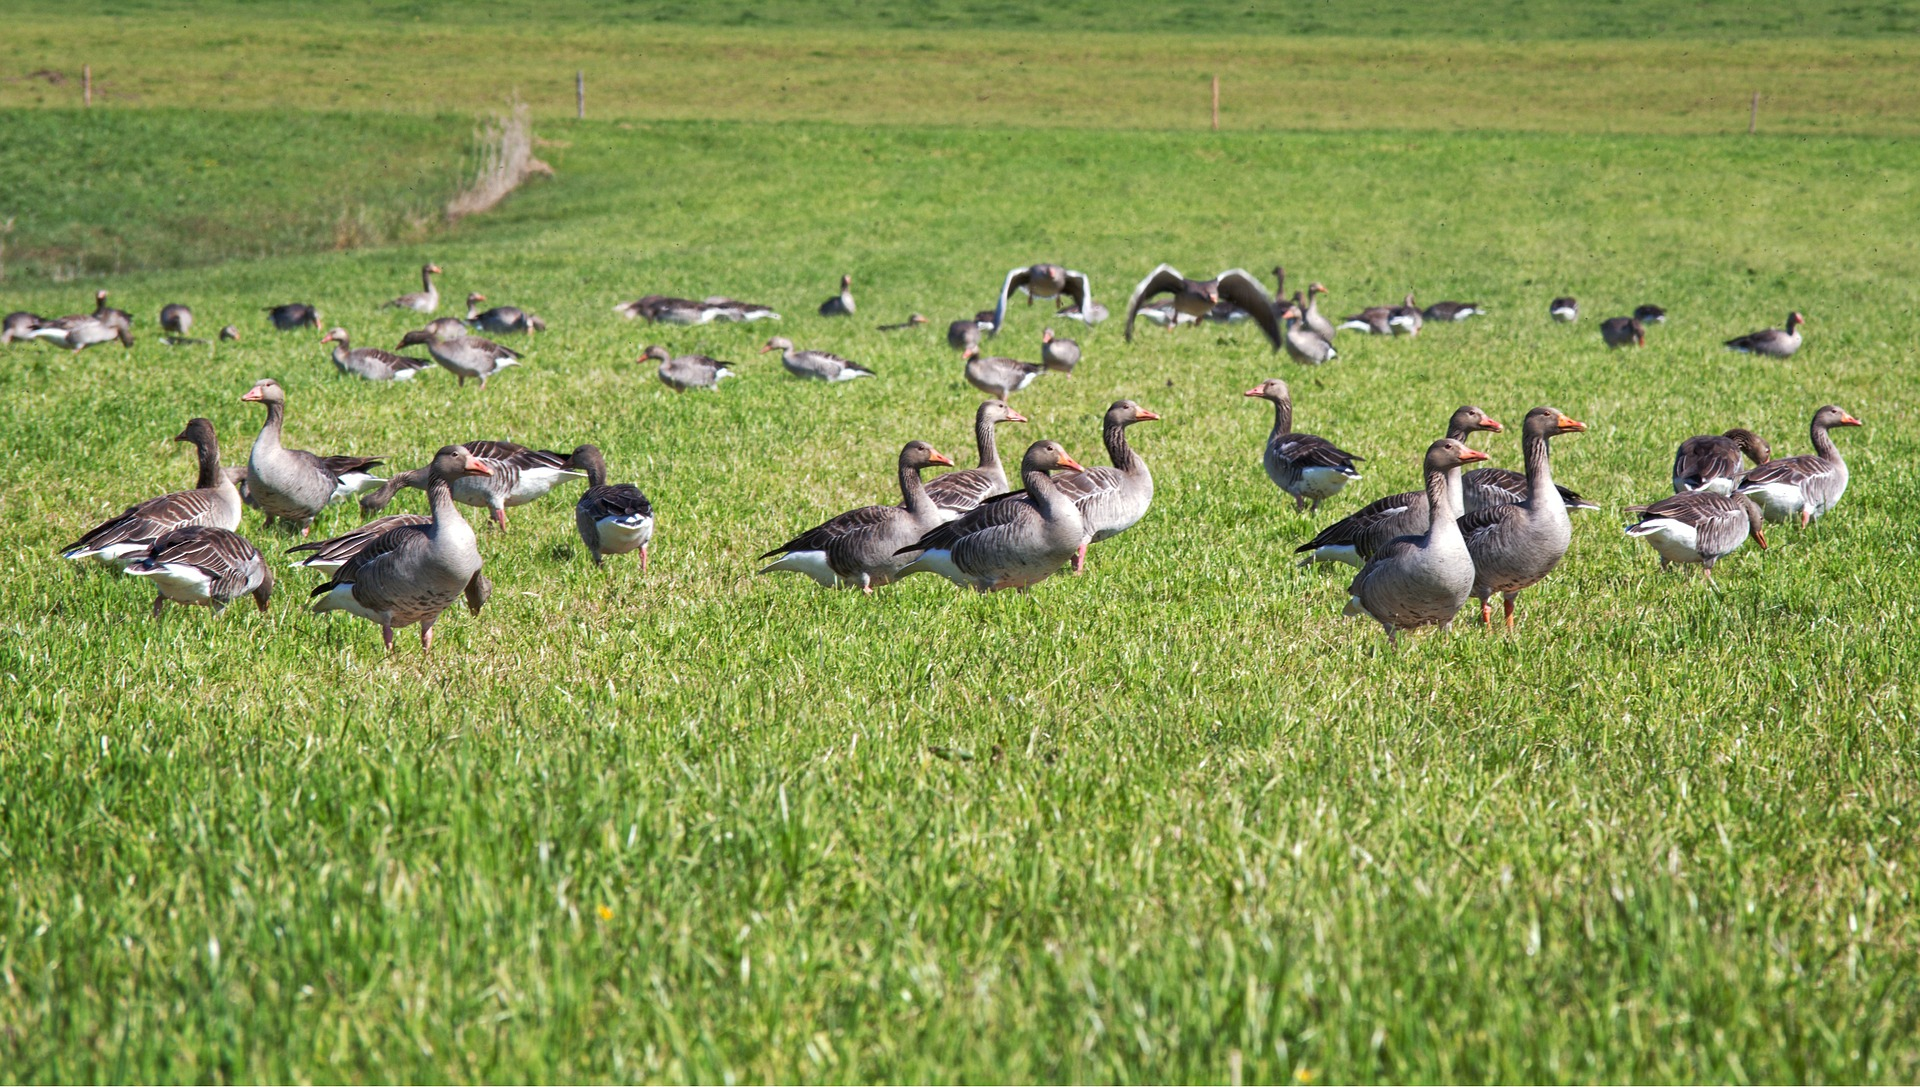 grey geese 1379435 1920